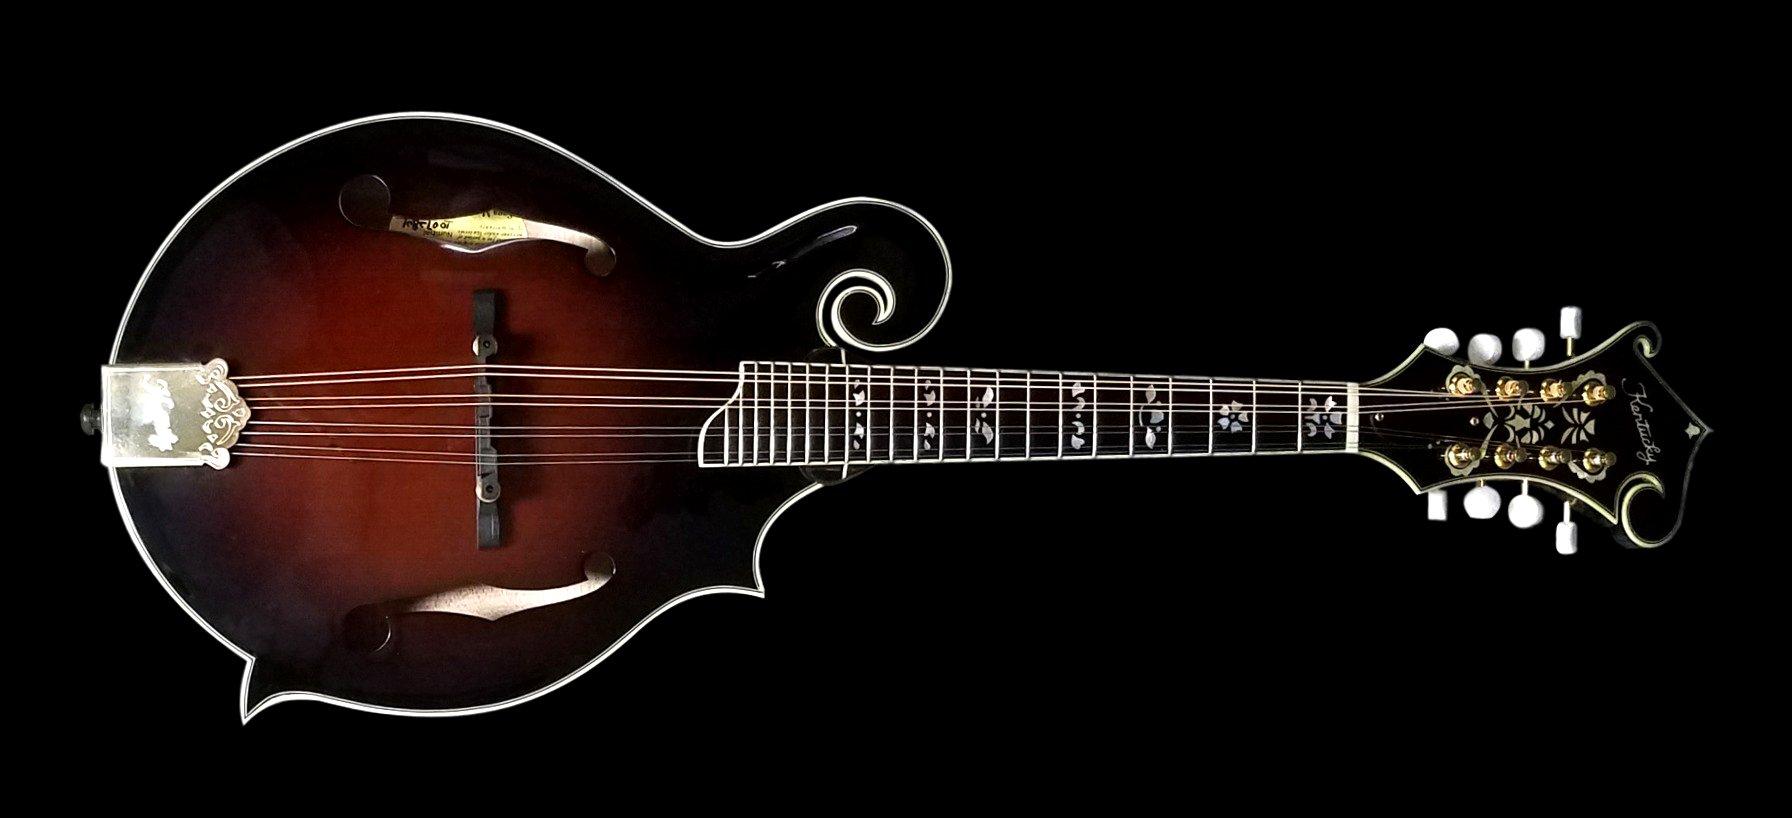 USED Kentucky KM-855 F-Style Mandolin